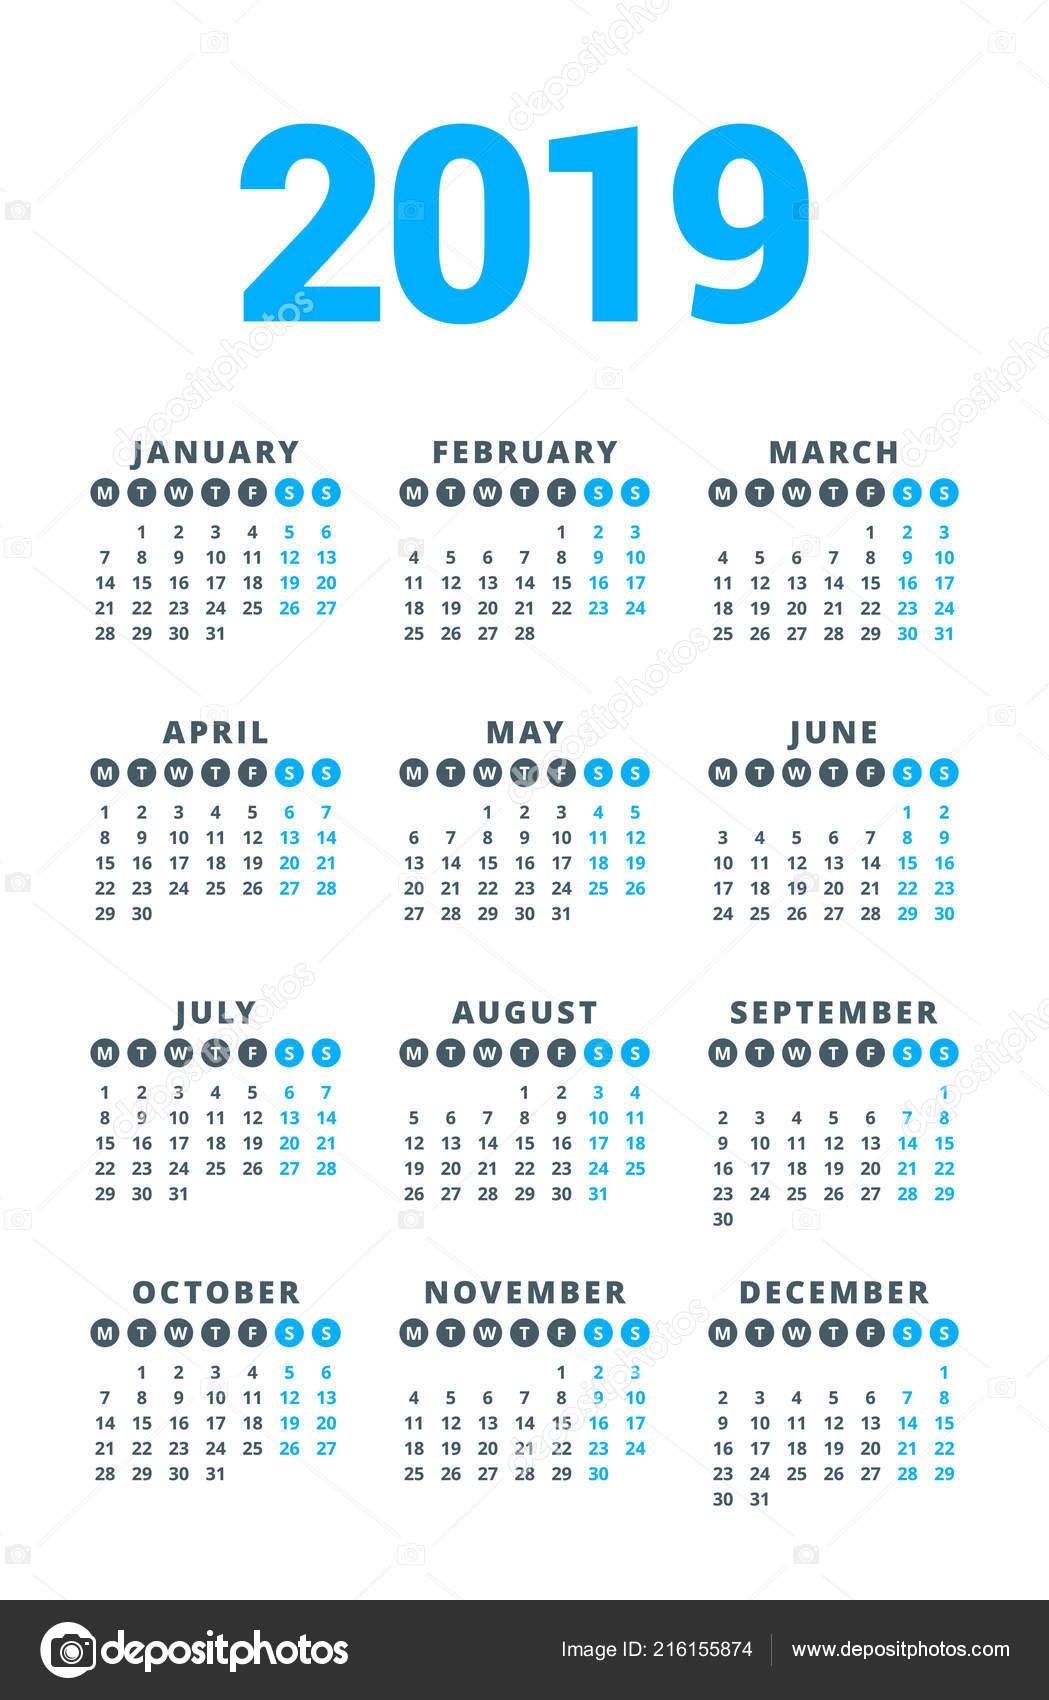 Calendar 2019 Year White Background Week Starts Monday Columns Rows Calendar 2019 3 Columns